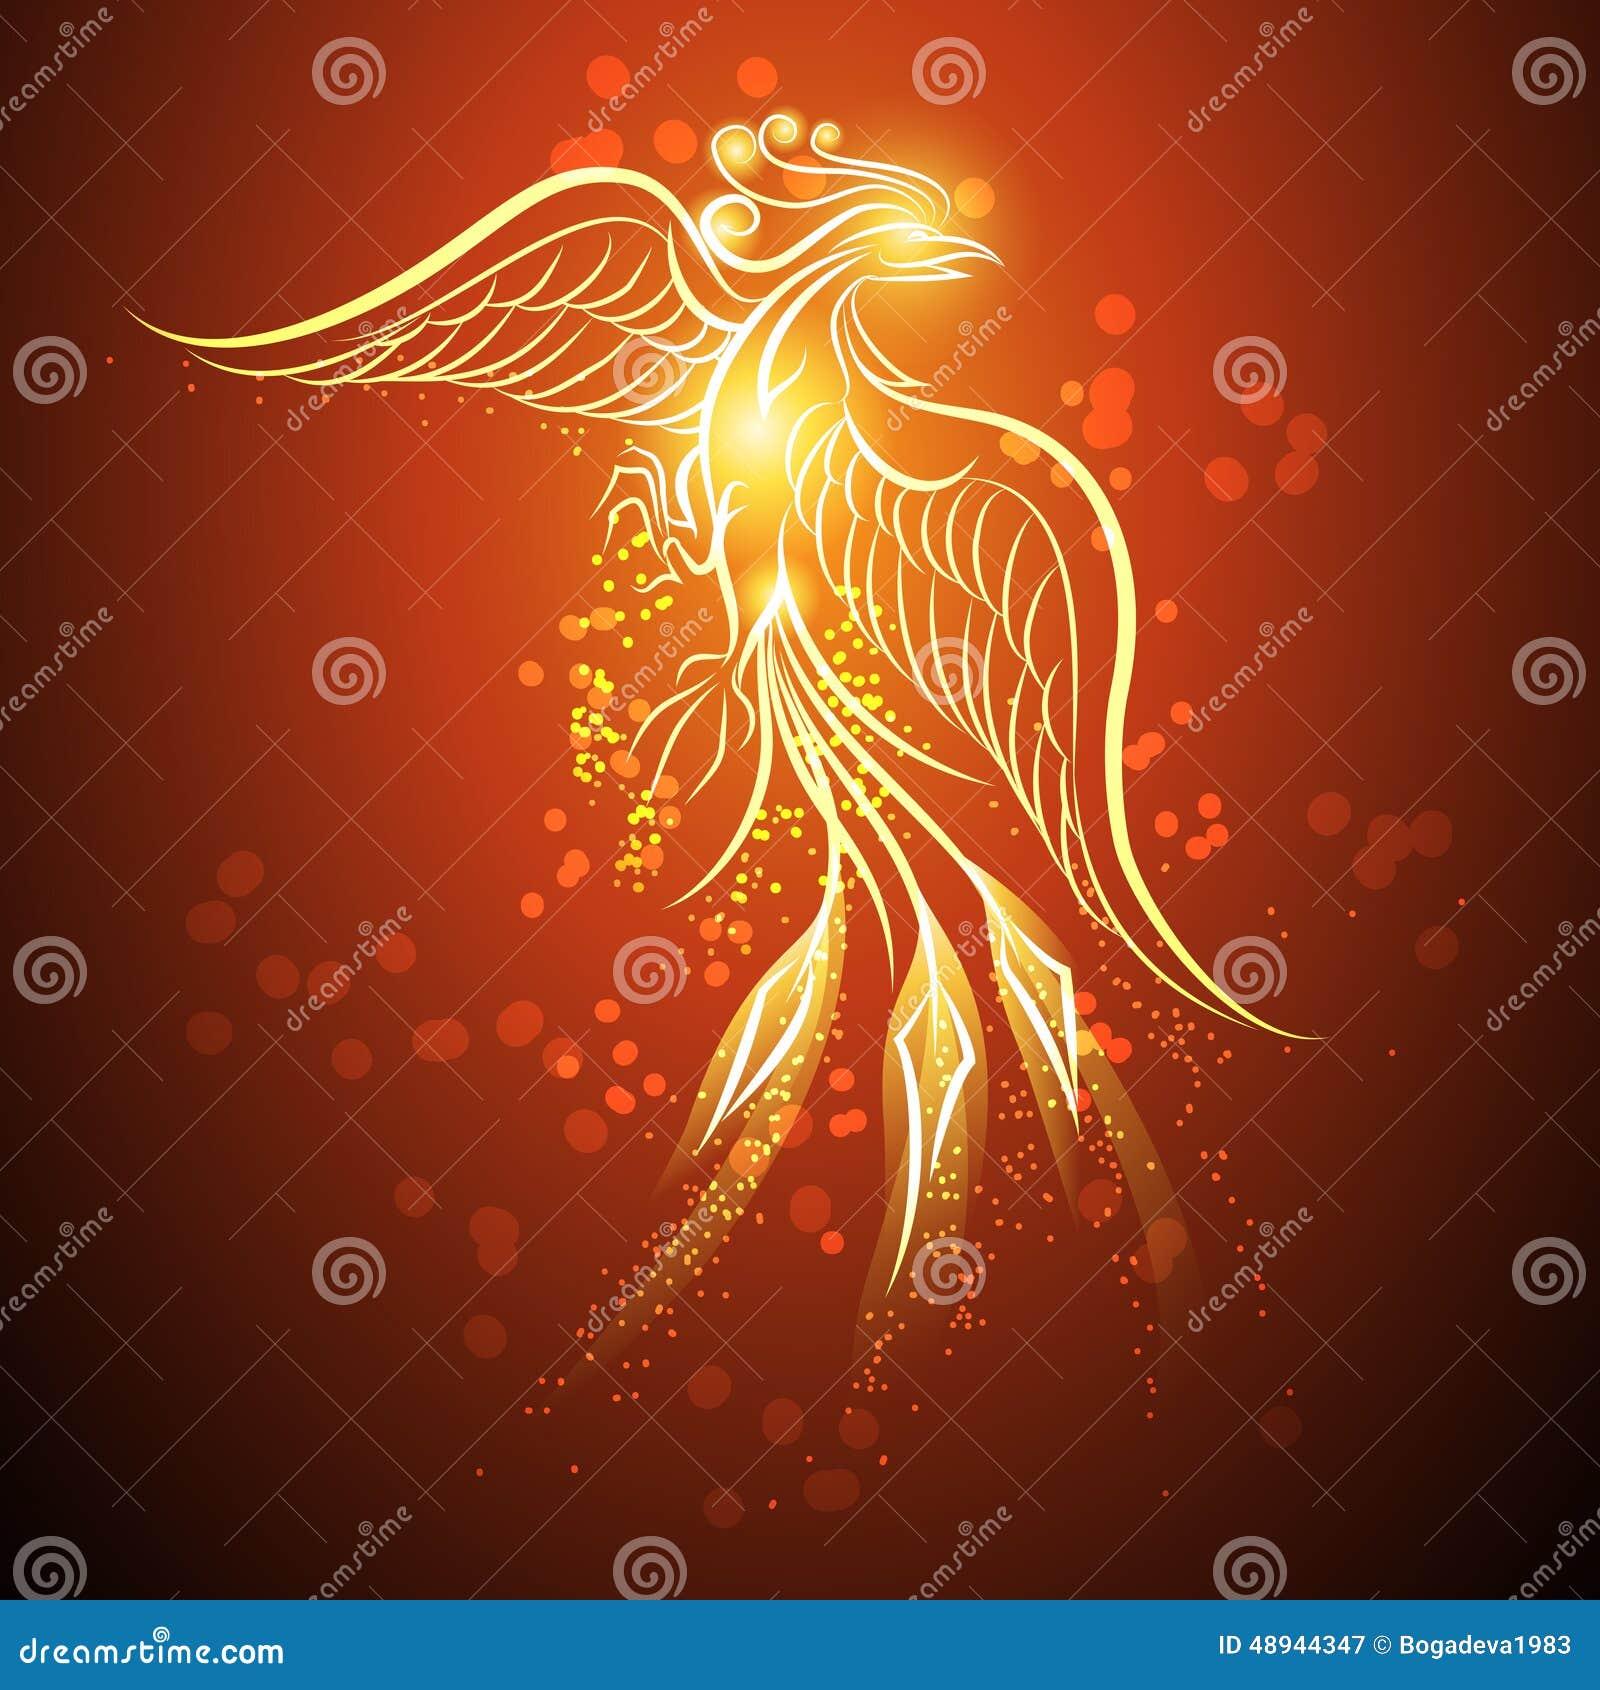 rising phoenix stock vector illustration of eagle myth